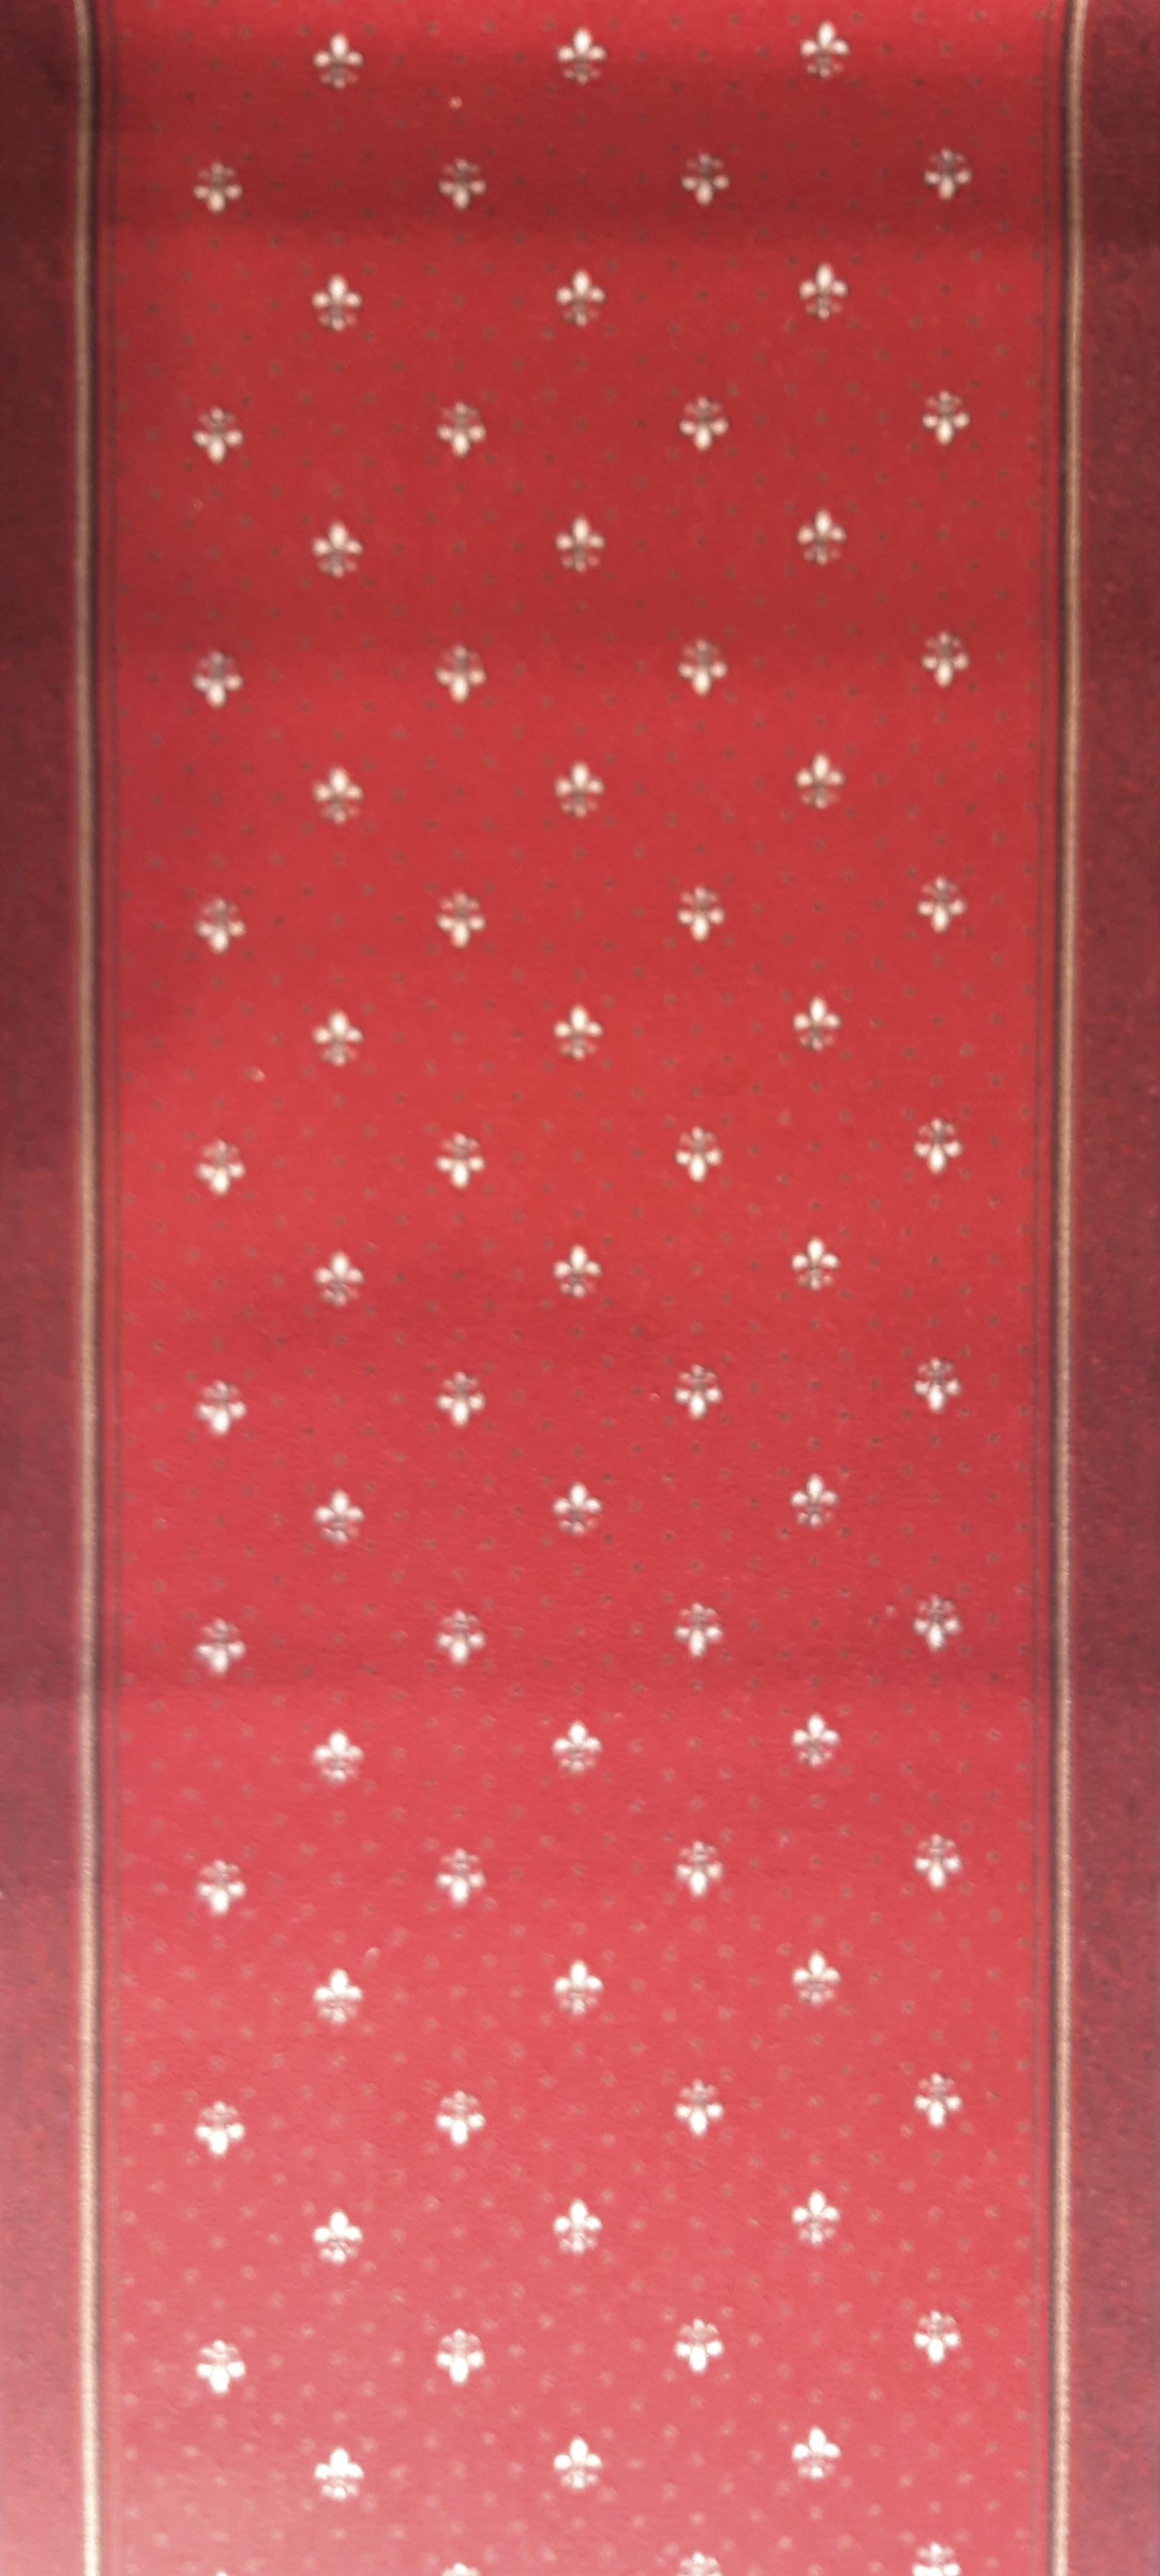 Traversa Tesatura Plata 1835, Rosu, 100x600 cm, 820 gr/mp 1